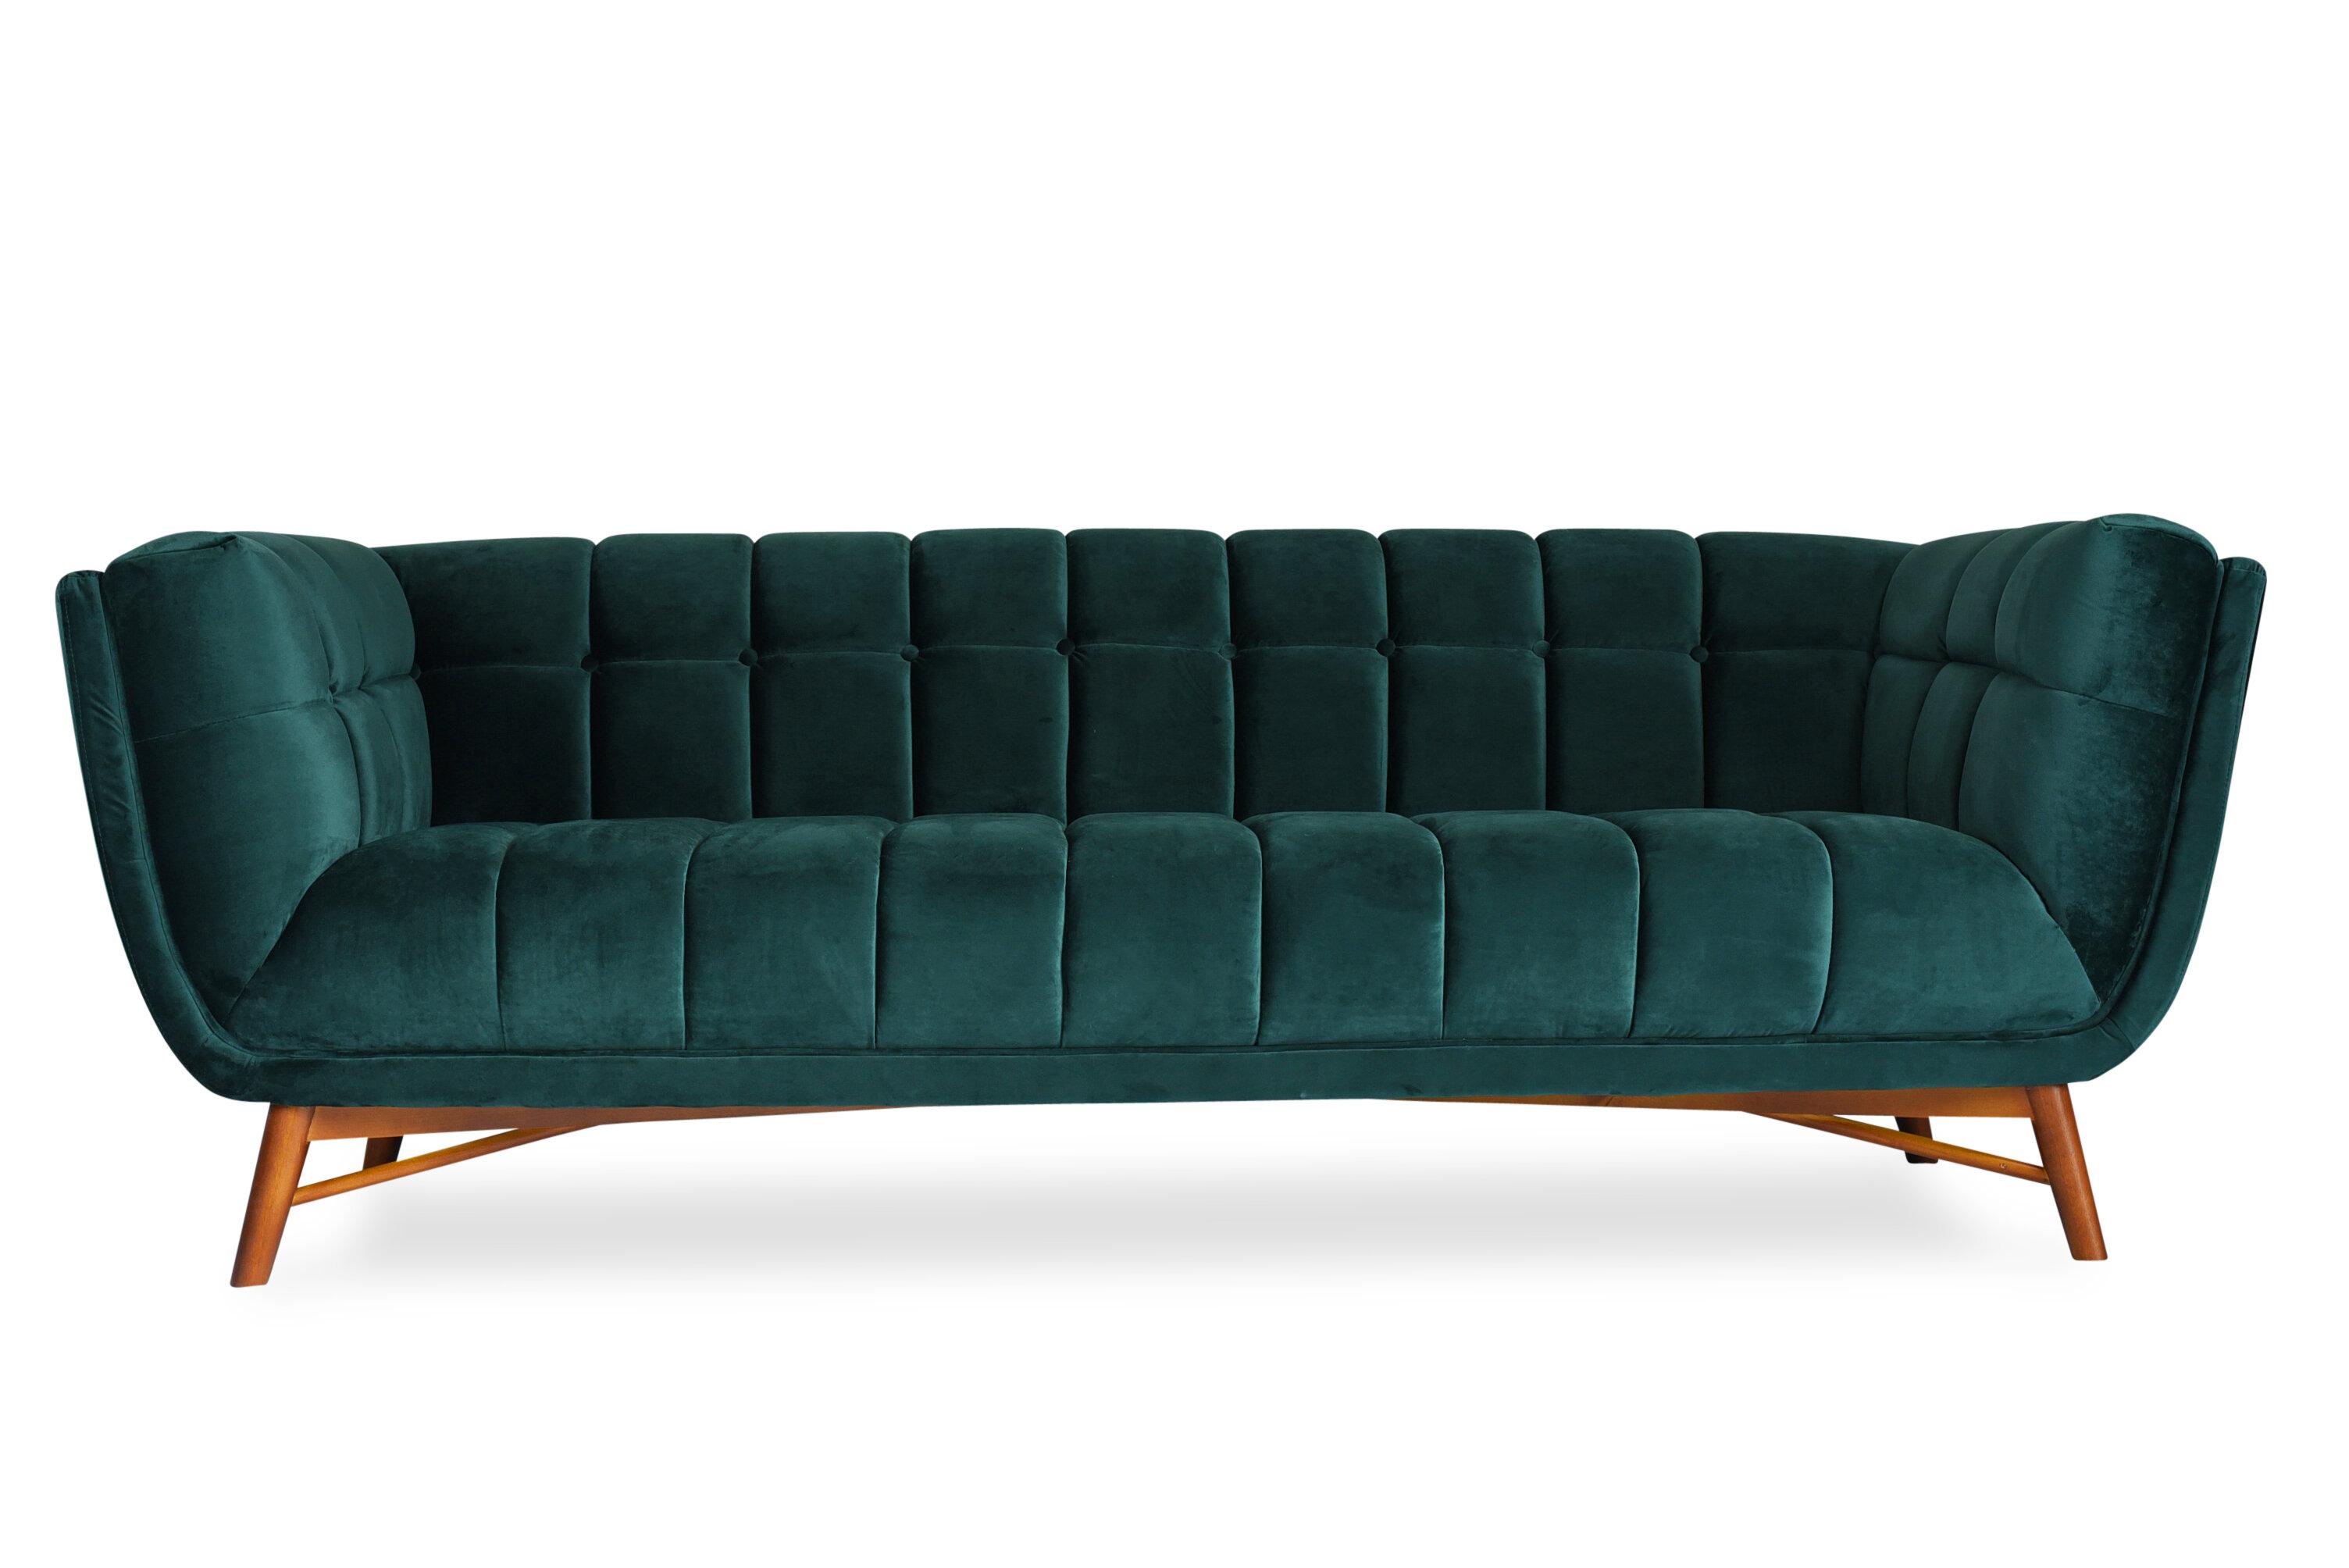 Everly Quinn Clarisse Mid Century Modern Chesterfield Sofa Wayfair